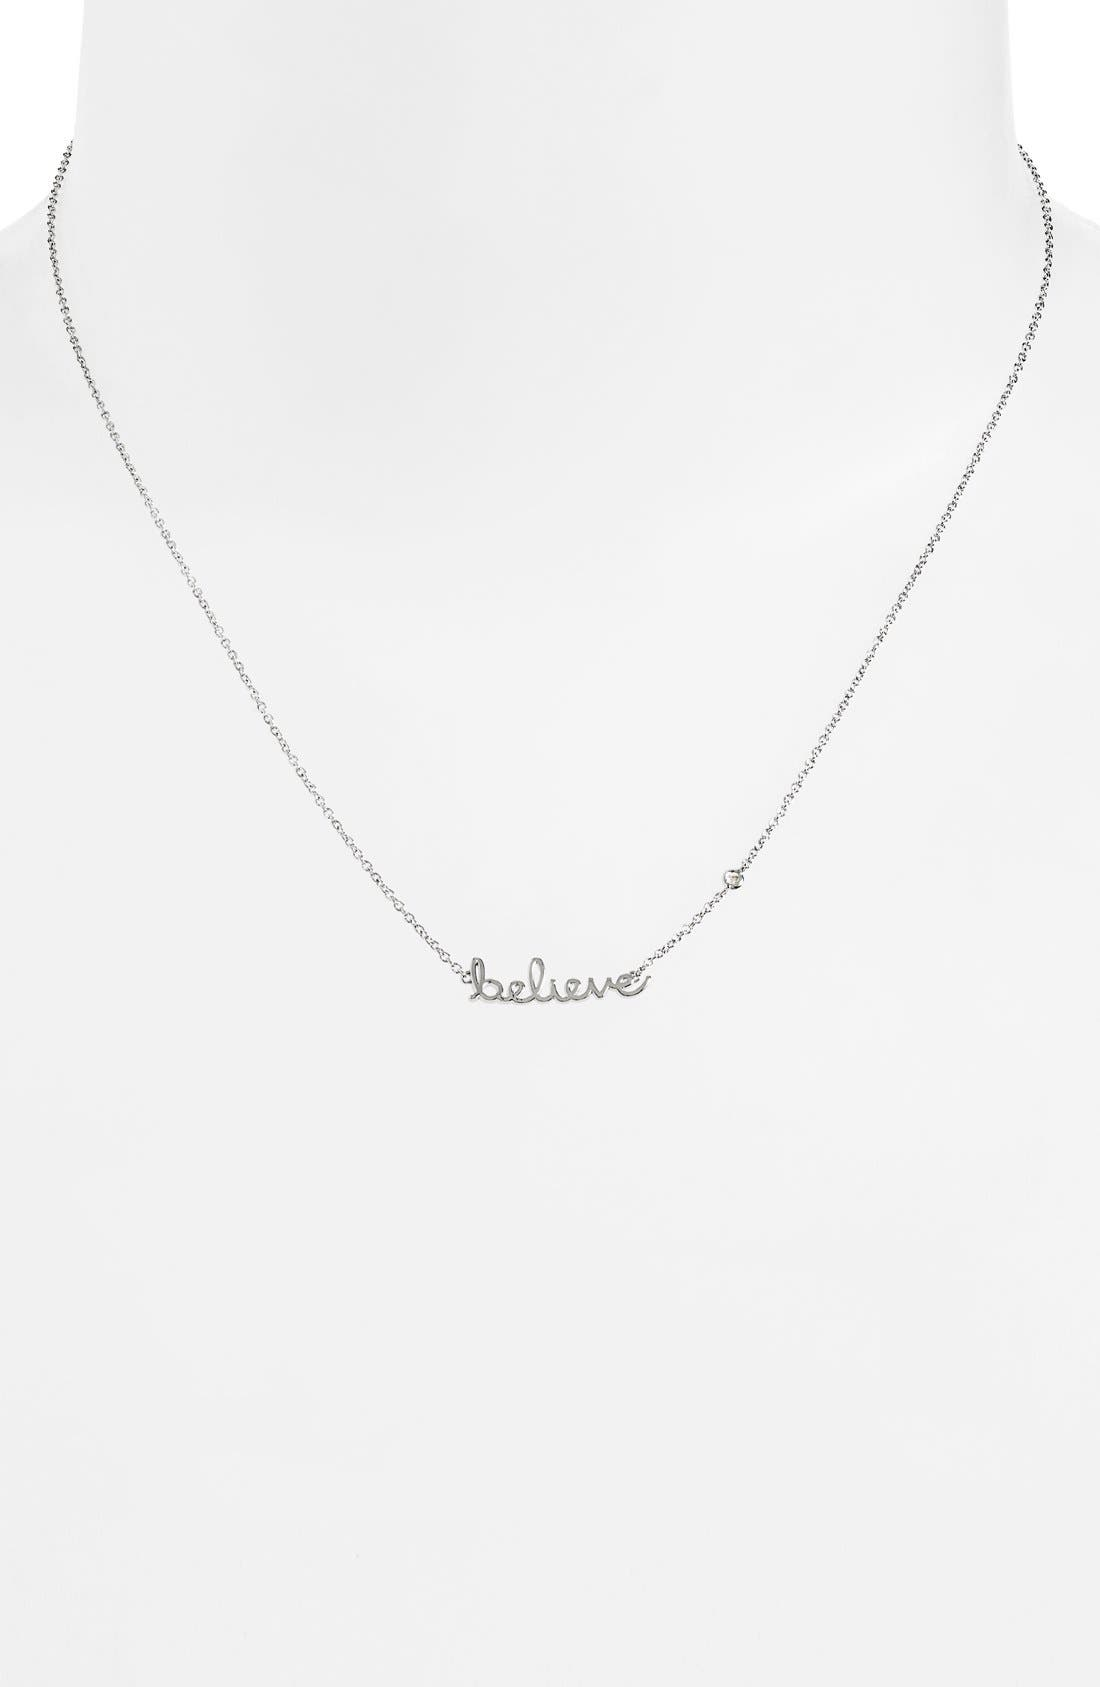 'Believe' Necklace,                             Alternate thumbnail 2, color,                             Silver